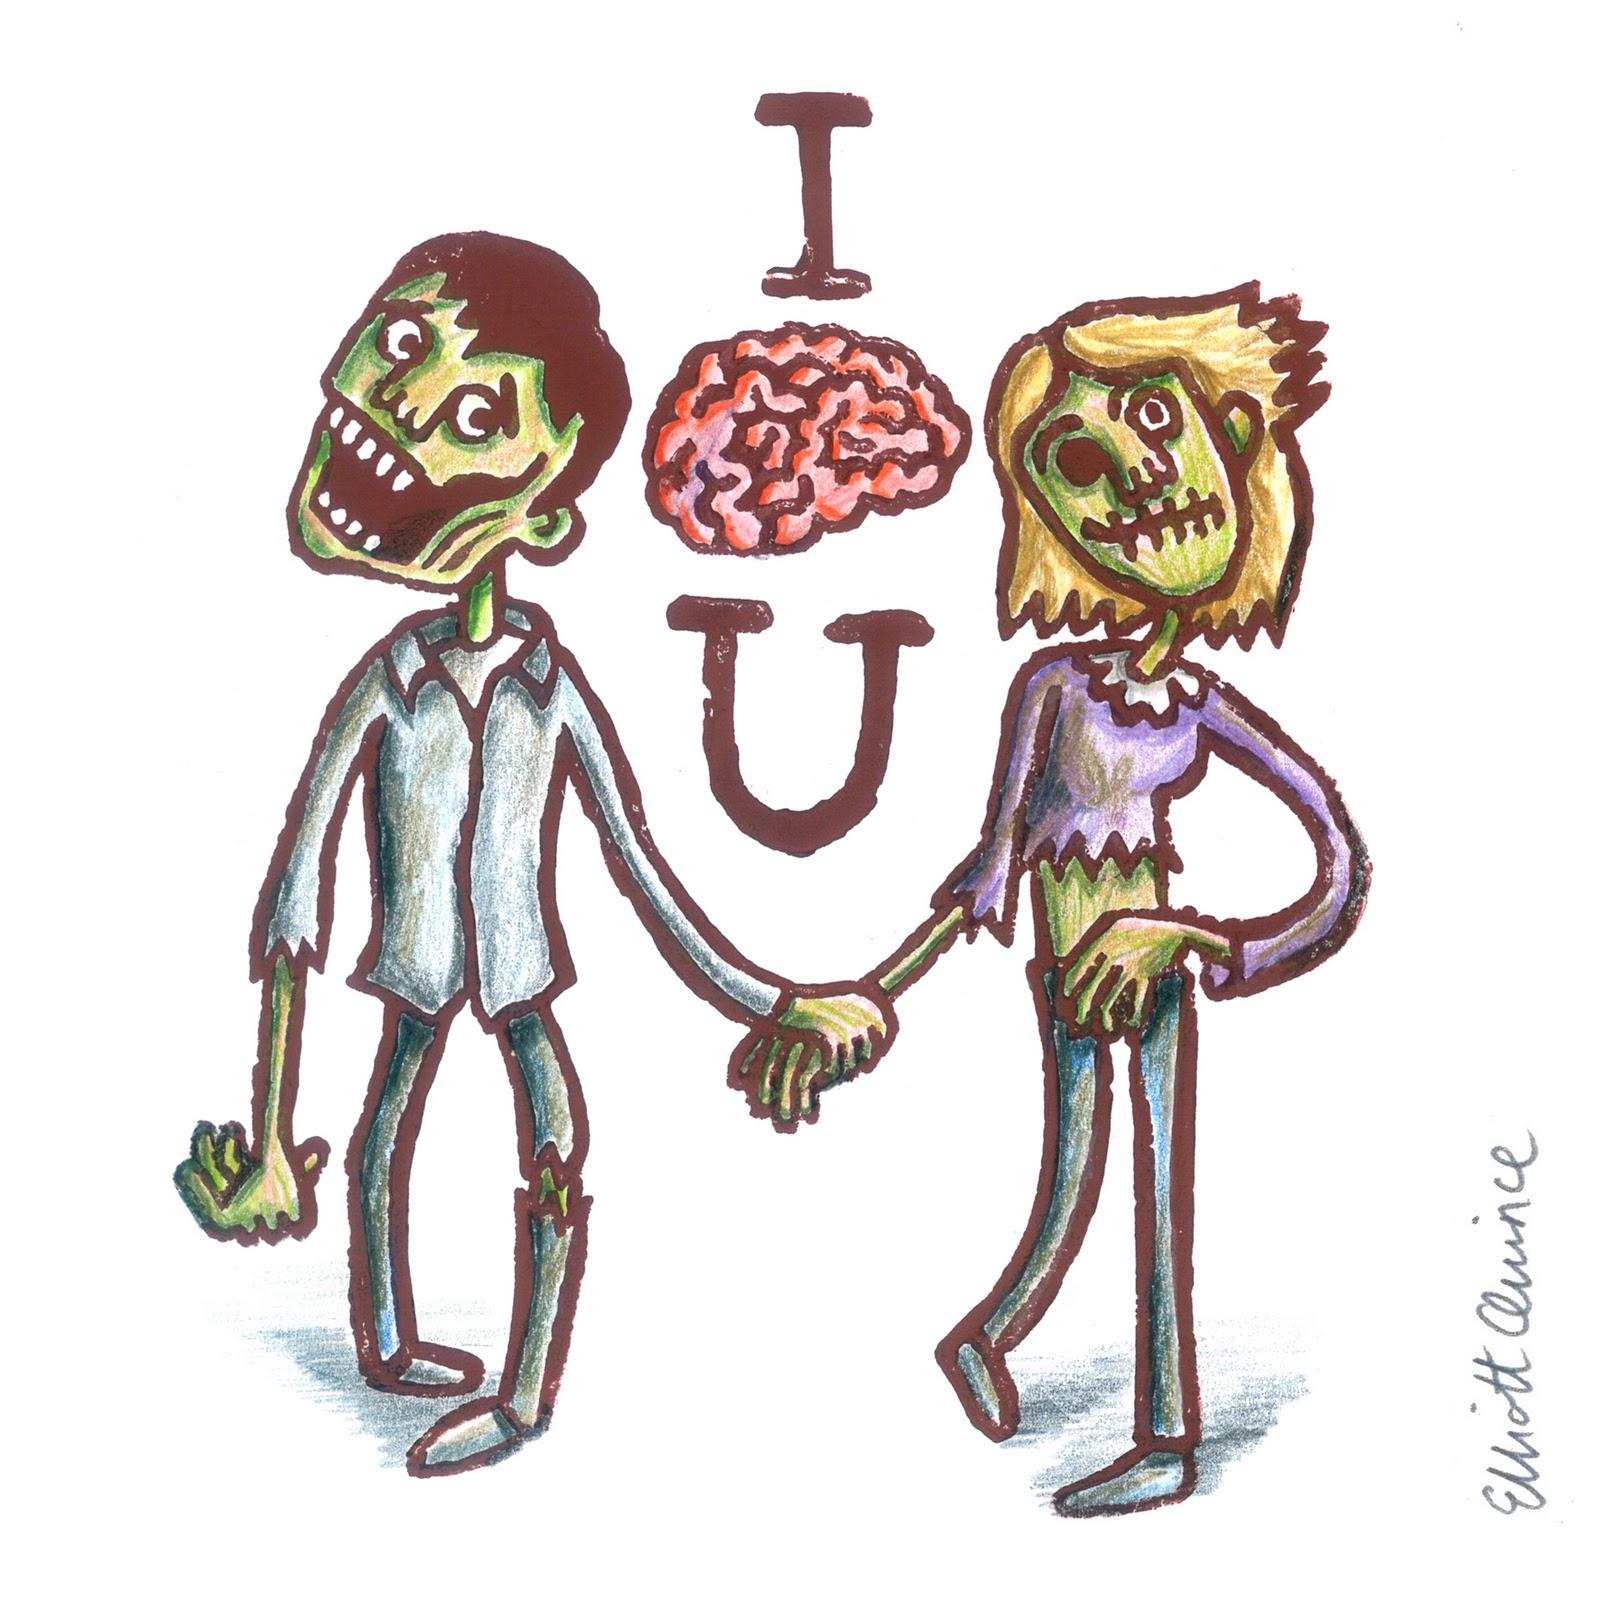 http://1.bp.blogspot.com/_2PZ7mkmrl28/TUq-ZMCDAeI/AAAAAAAAAZ8/QAl-JOpgBR8/s1600/Zombie_valentines_1_+Elliott_Quince.jpg